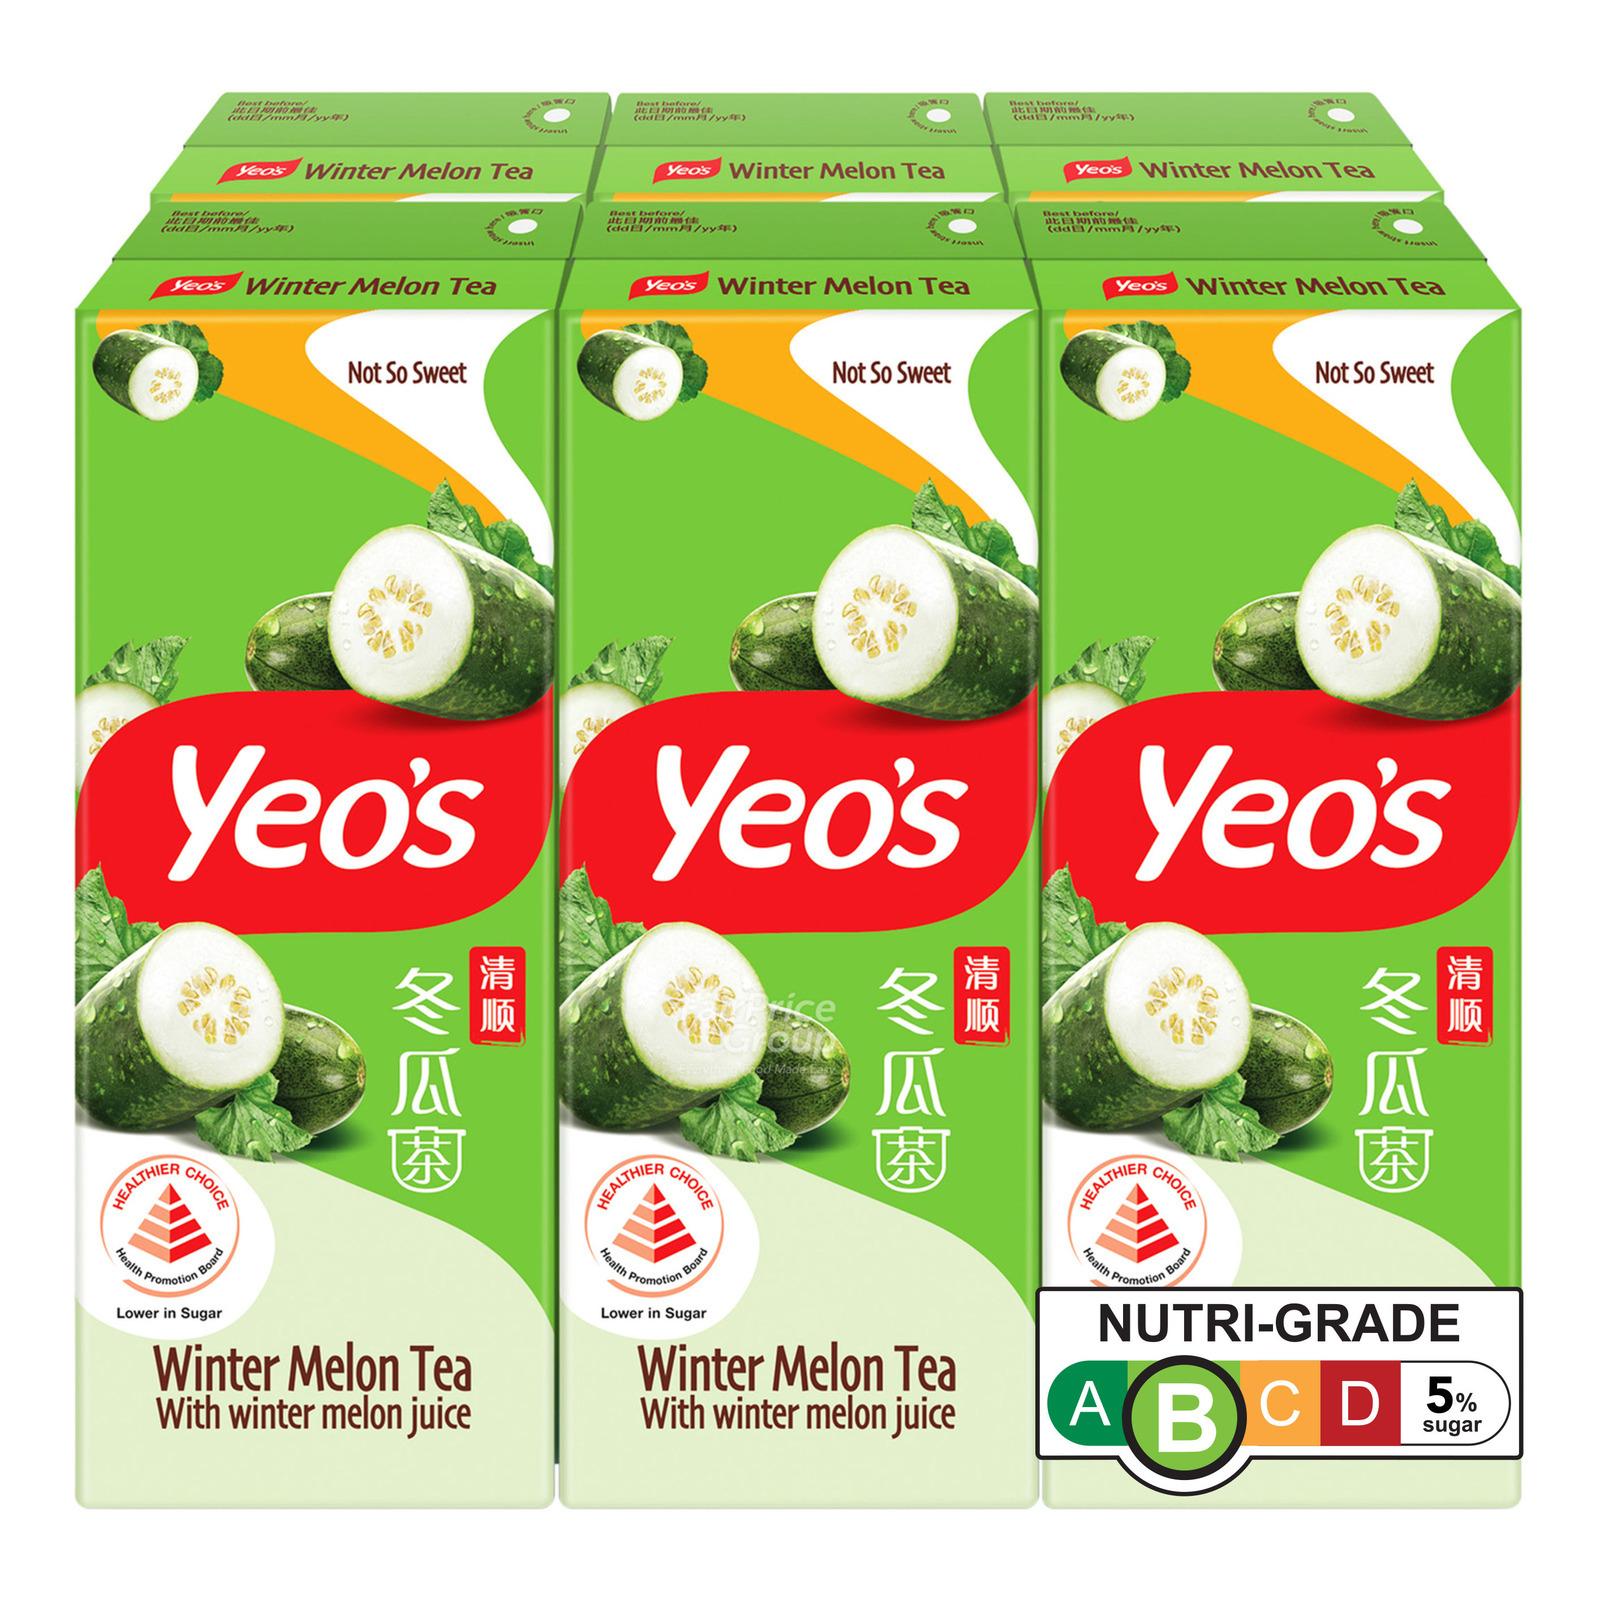 Yeo's Packet Drink - Winter Melon Tea (Not So Sweet)